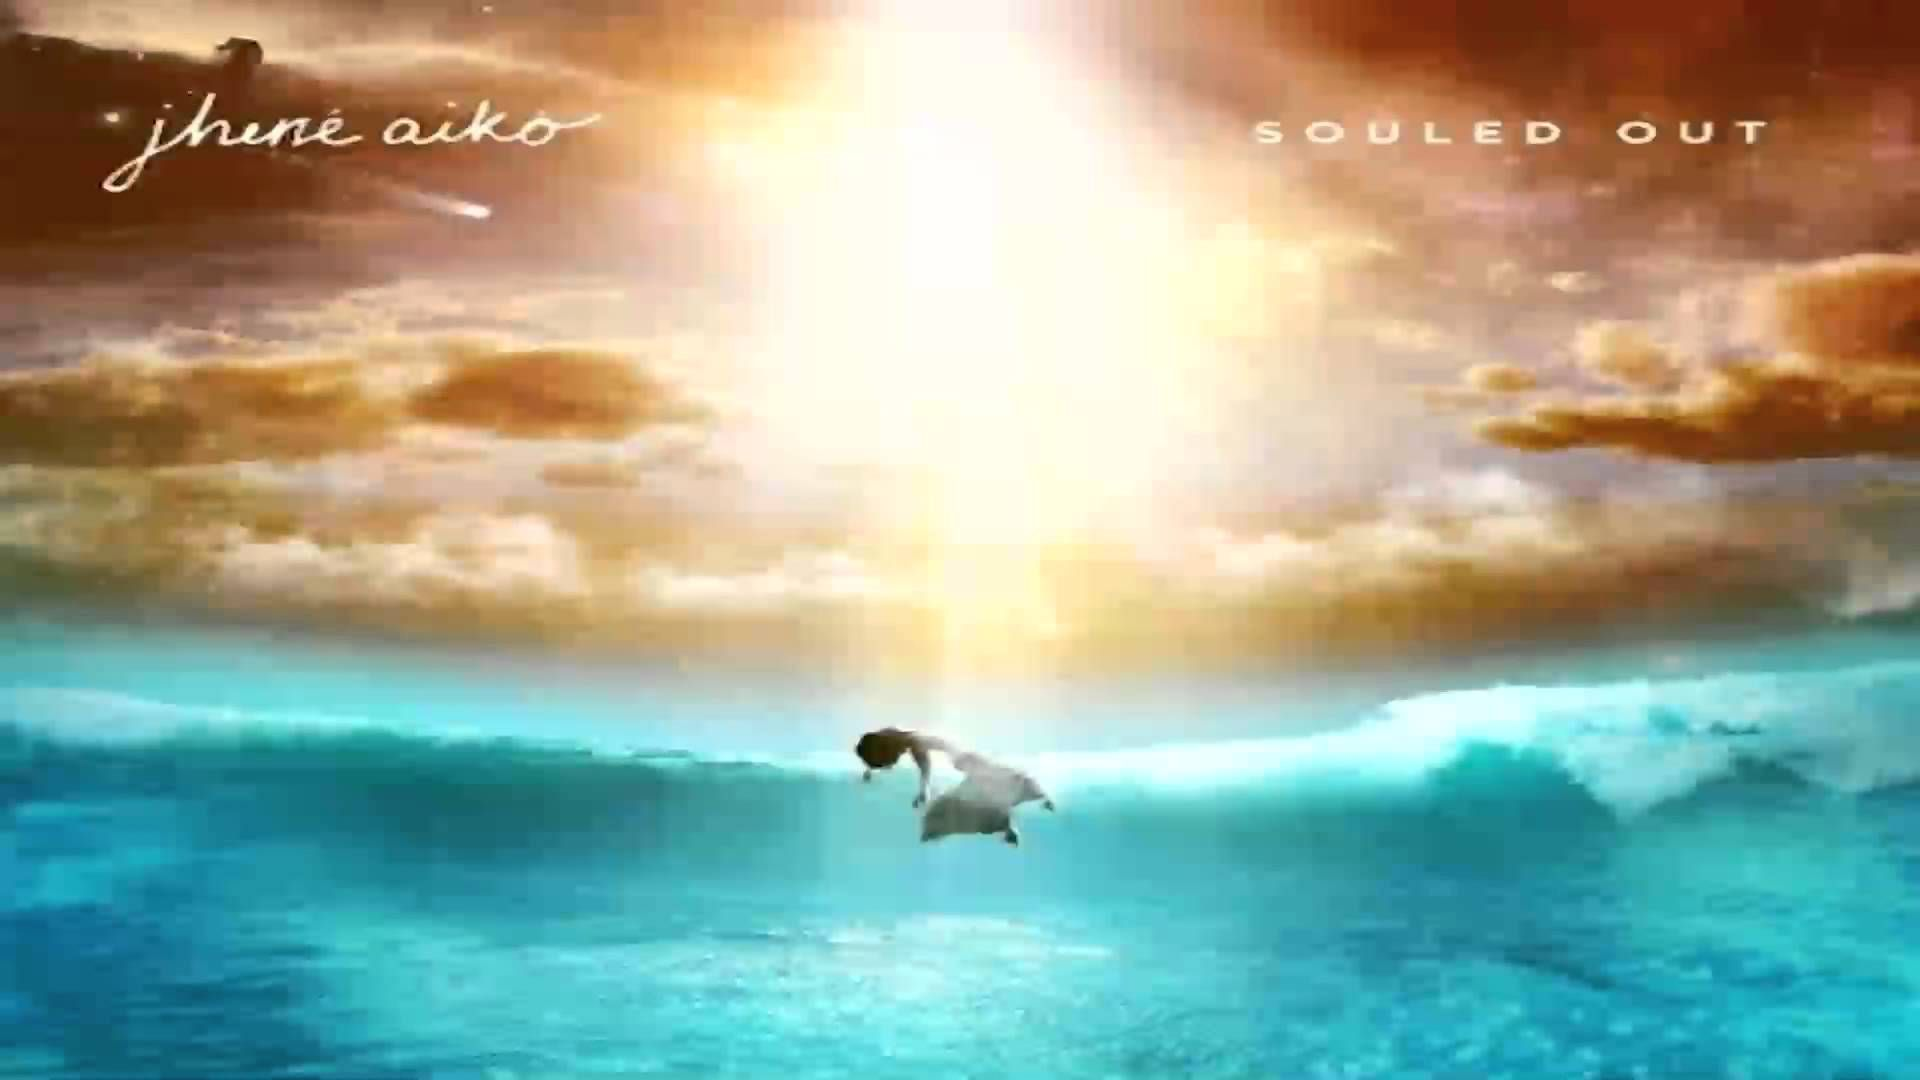 Jhene Aiko Eternal Sunshine Souled Out Lyrics Jhene Aiko Jhene Aiko Album Jhene Aiko Remember